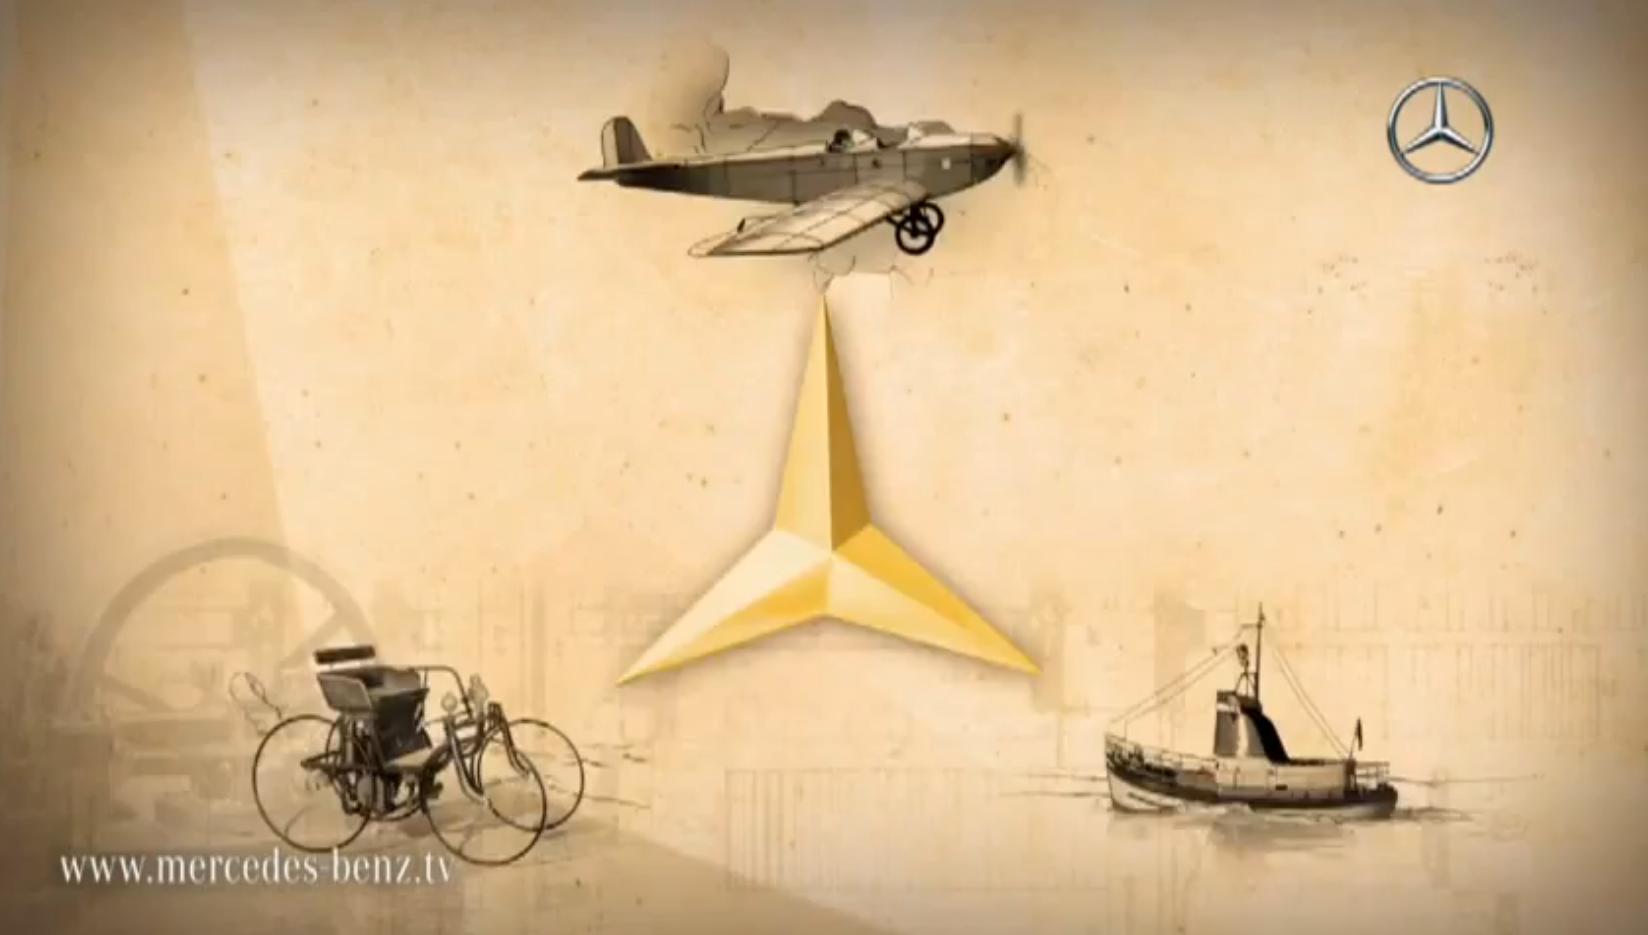 Origin Of Mercedes Benz Star